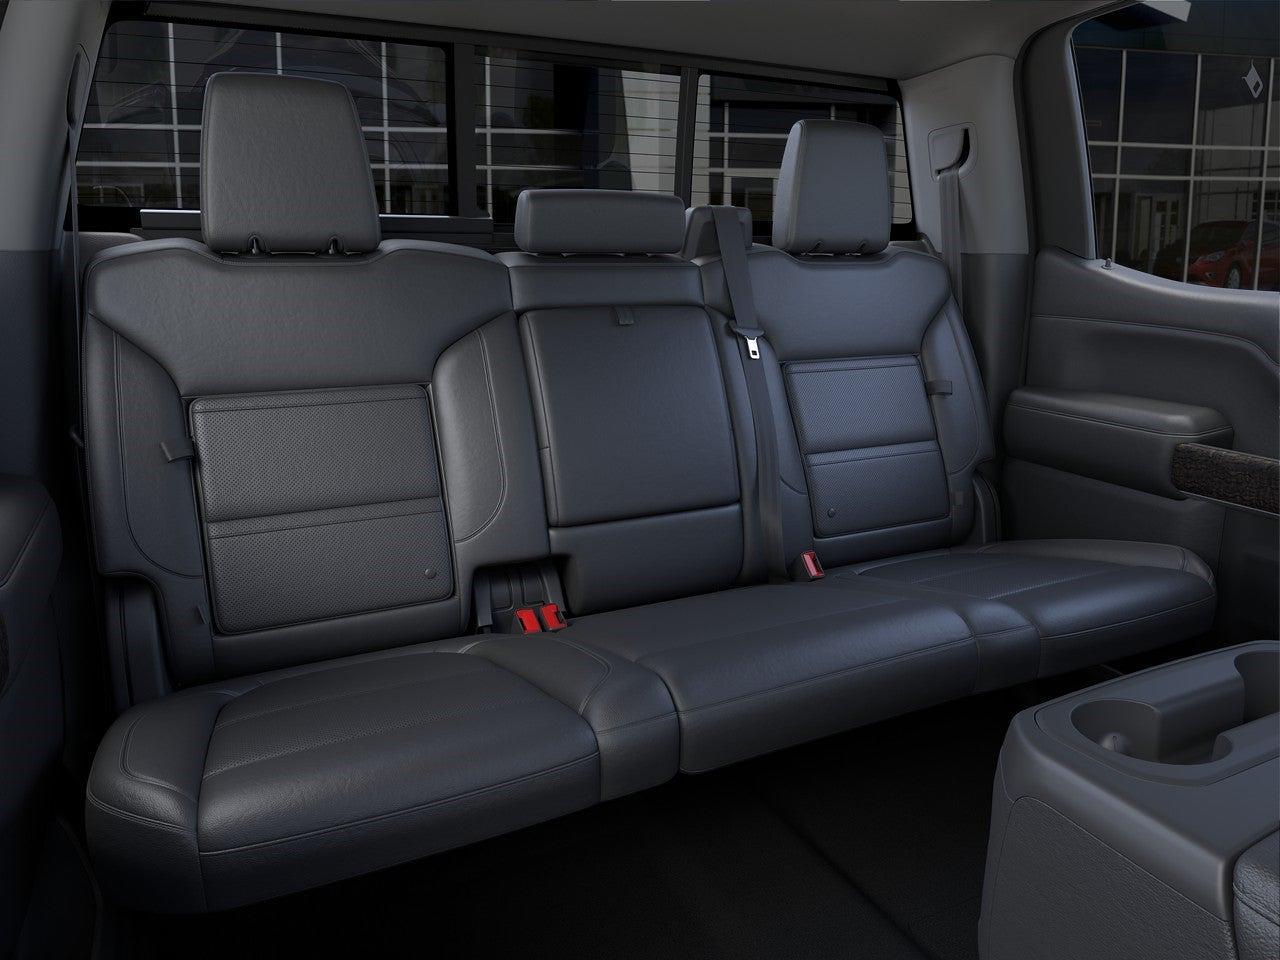 2021 GMC Sierra 1500 Crew Cab 4x4, Pickup #V21153 - photo 14